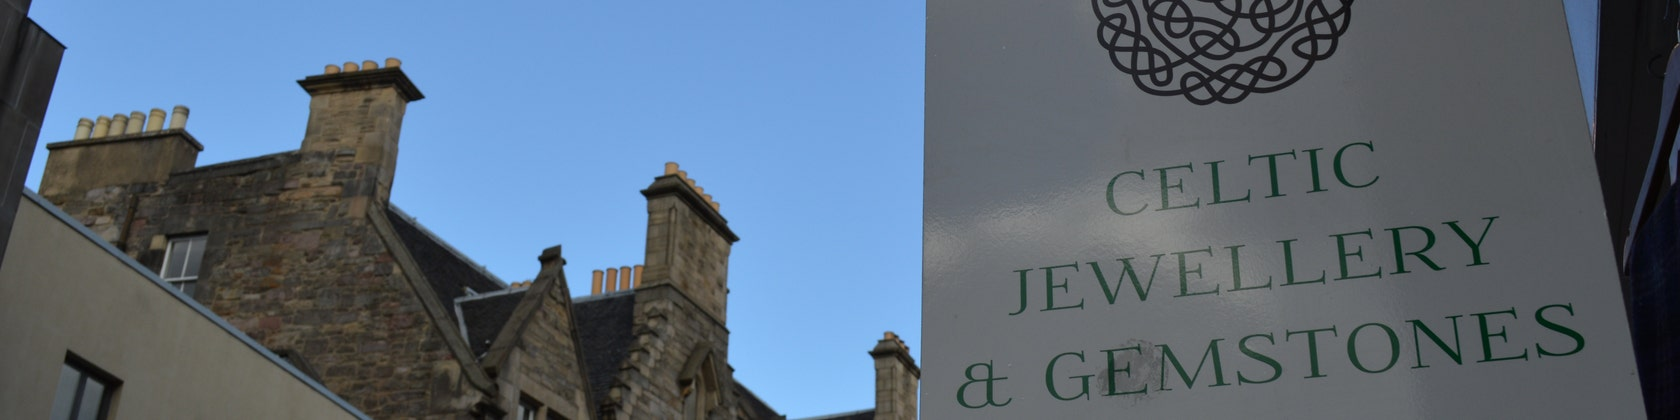 Celtic Jewellery and Gemstones por 24highstreet en Etsy